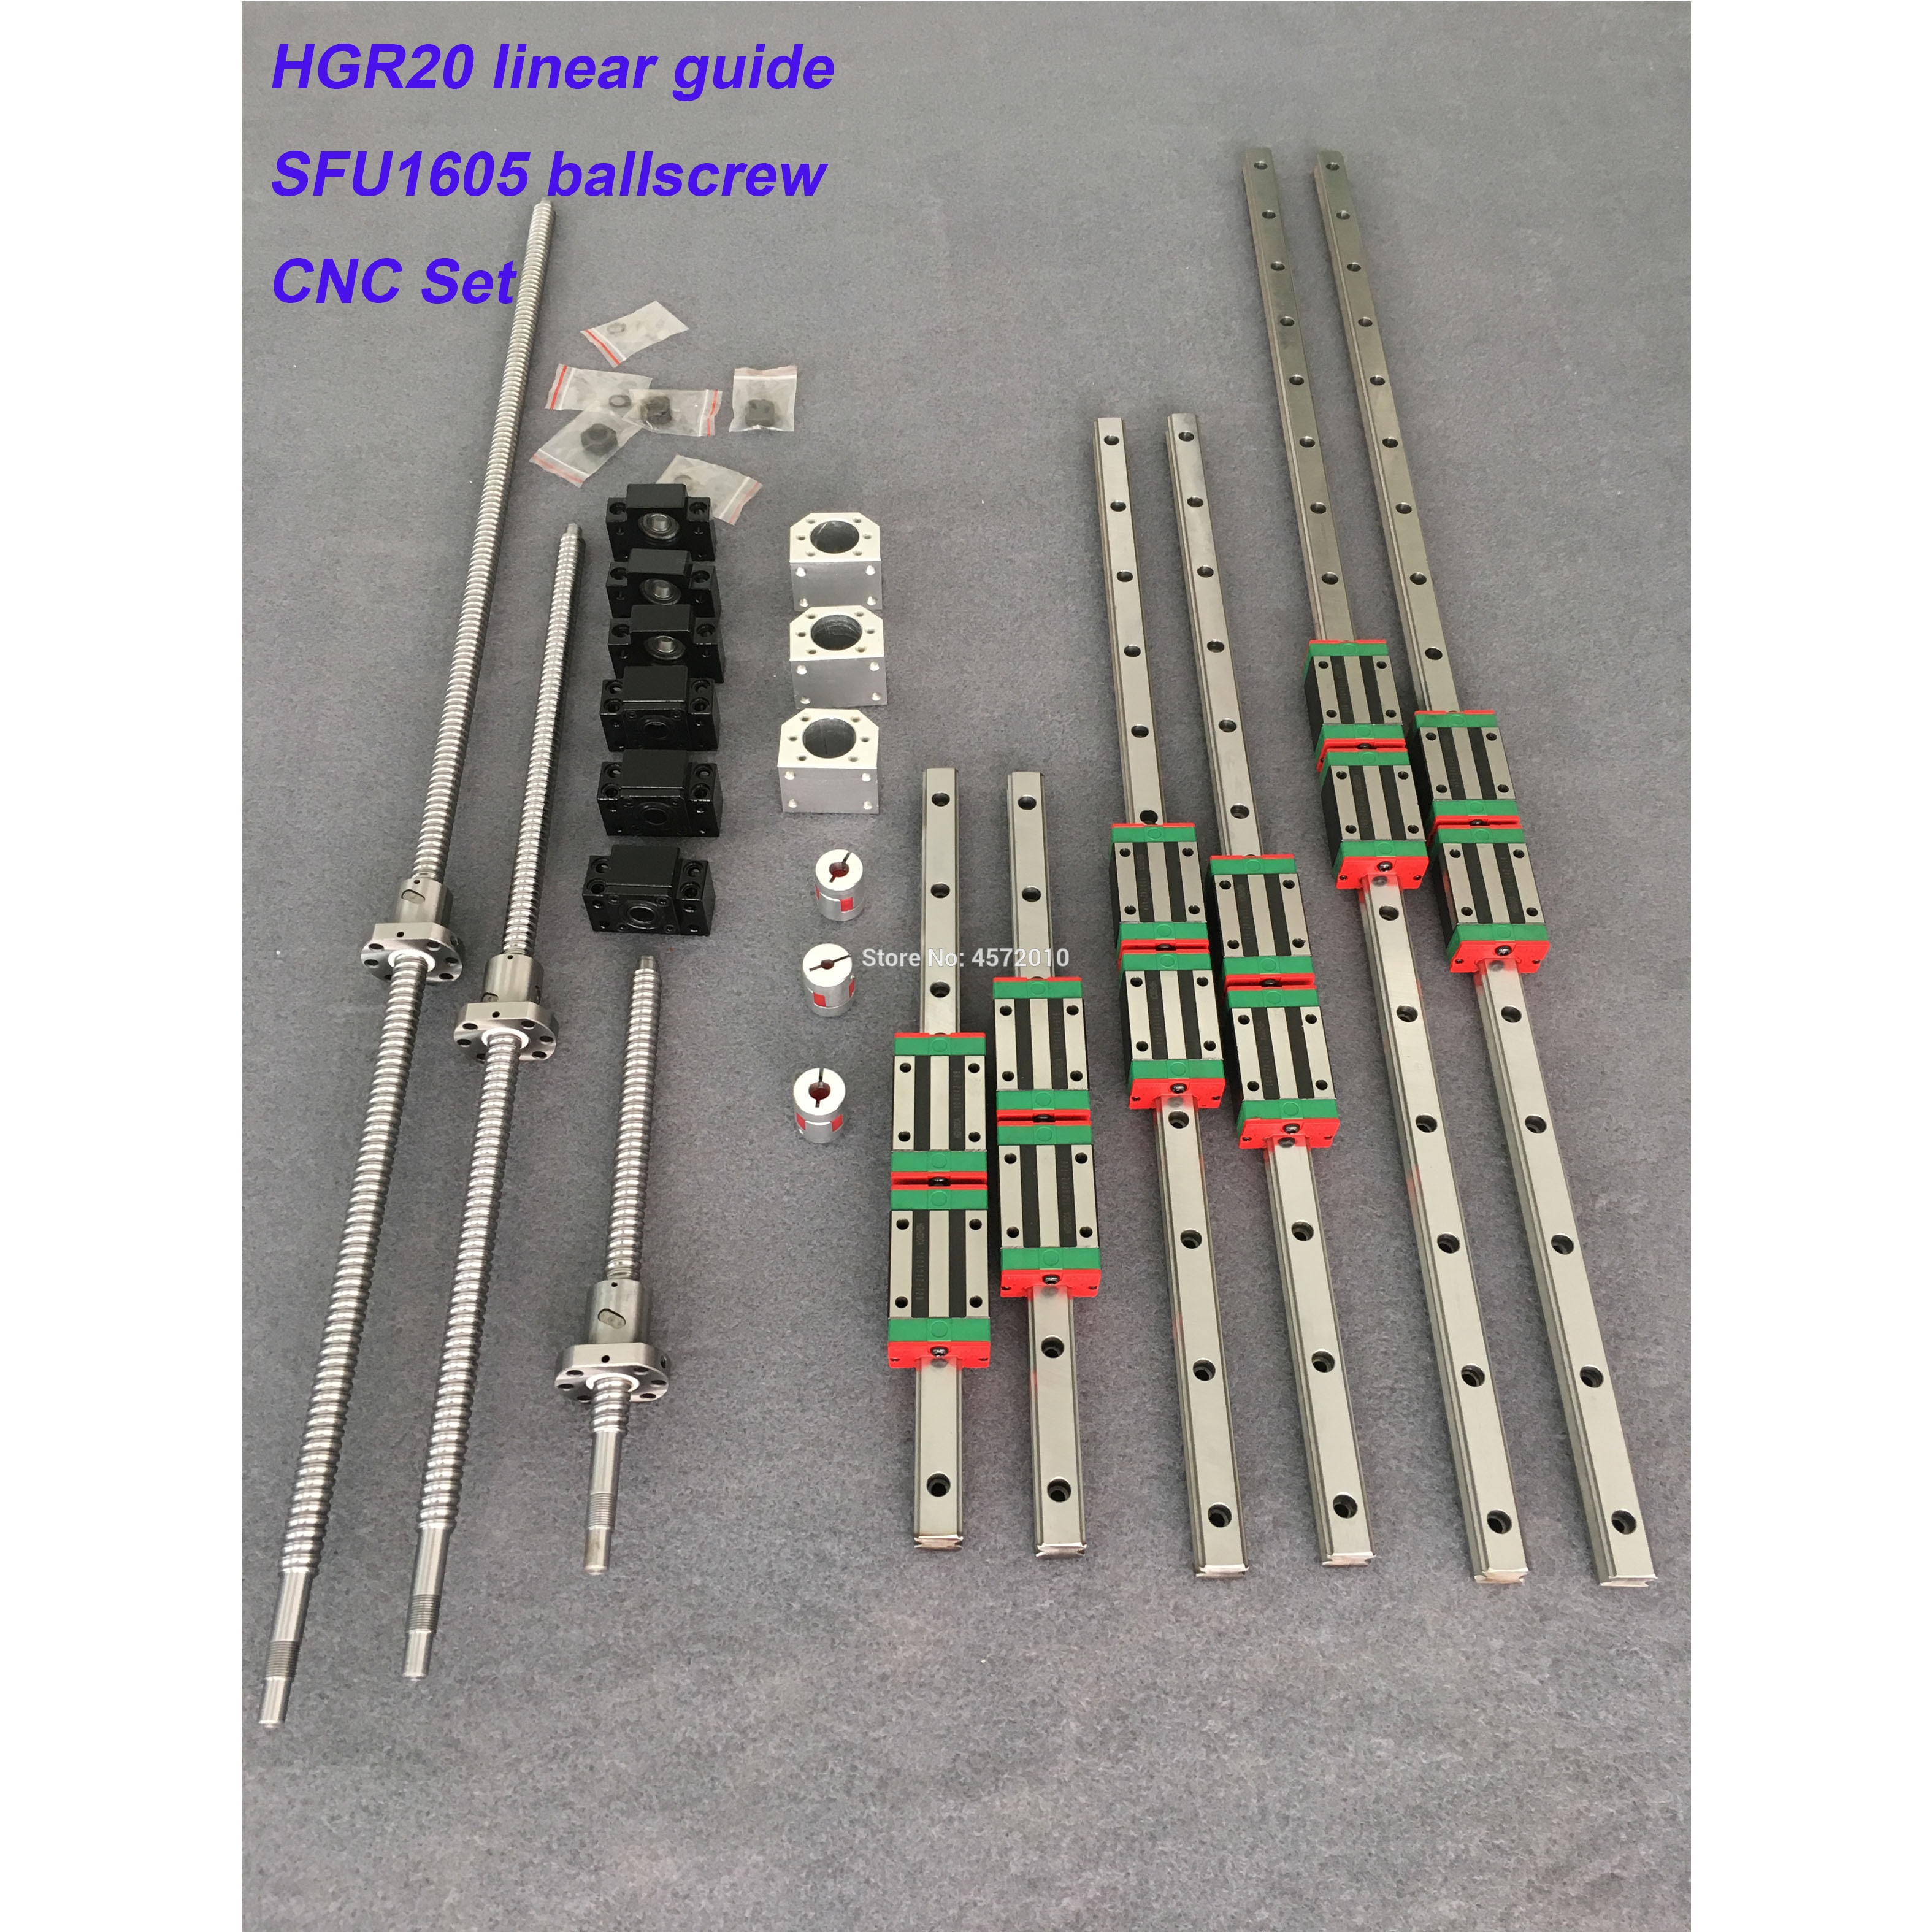 HGR20 الخطي دليل السكك الحديدية مجموعة HGR20 - 400/860/1240 مللي متر + SFU1605 - 350/800/1120/1120 مللي متر ballscrew + BK12 BF12 CNC أجزاء